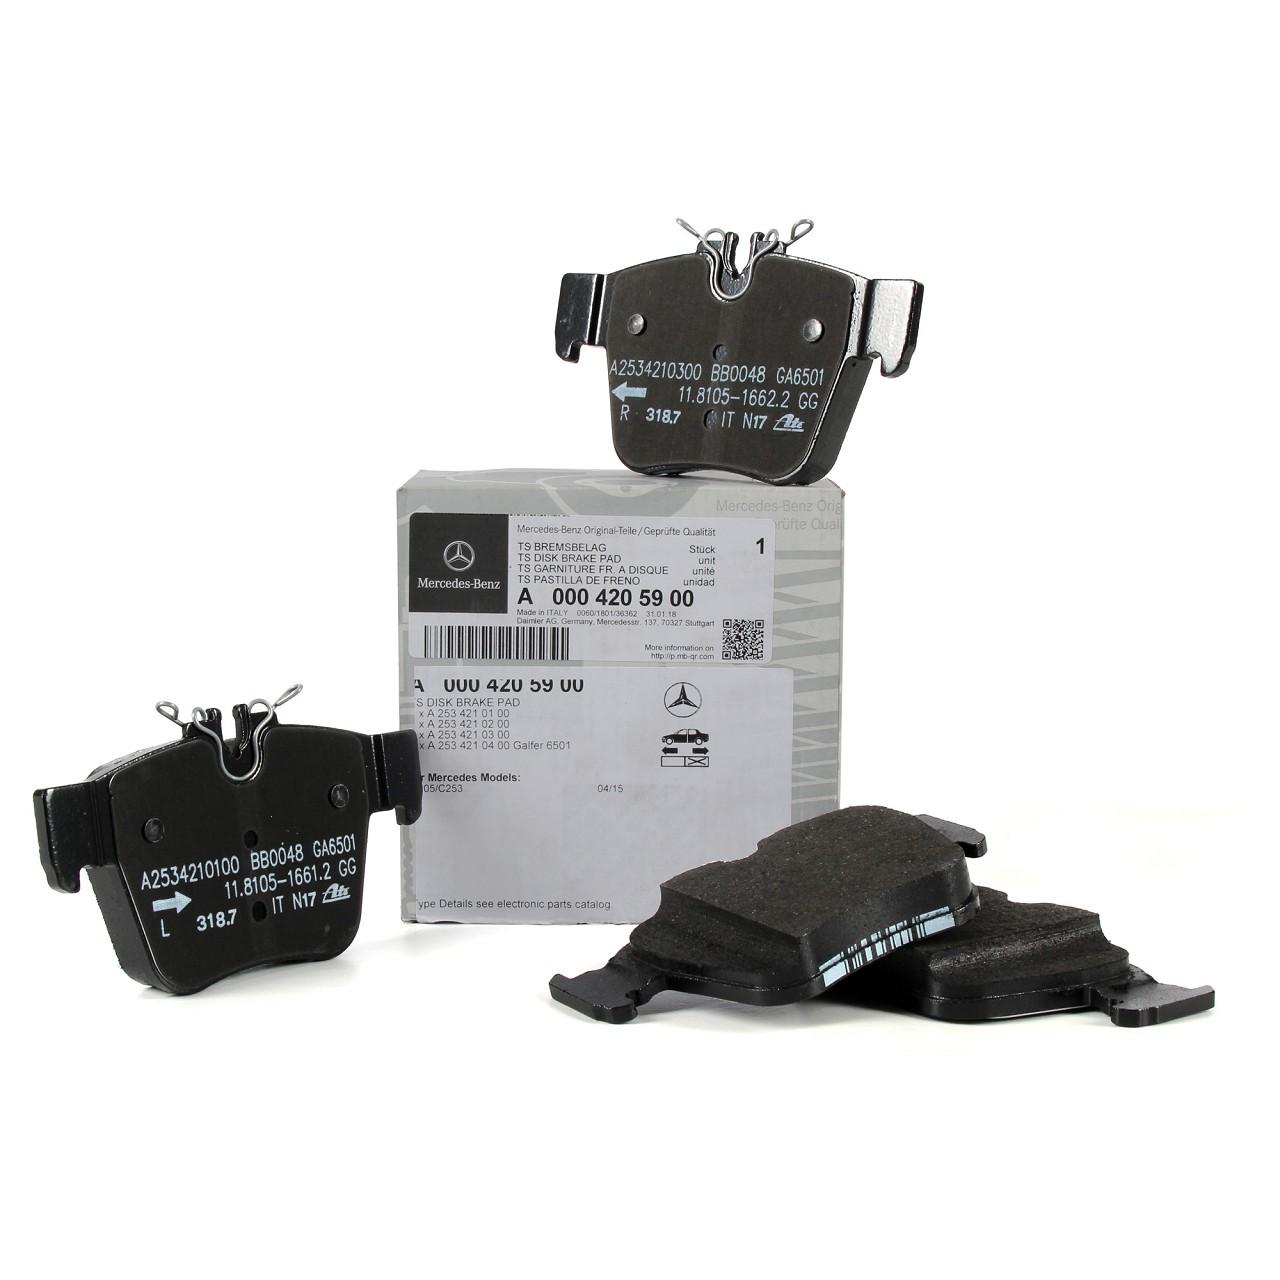 ORIGINAL Mercedes-Benz Bremsbeläge Bremsklötze W205 X253 C253 hinten 0004205900